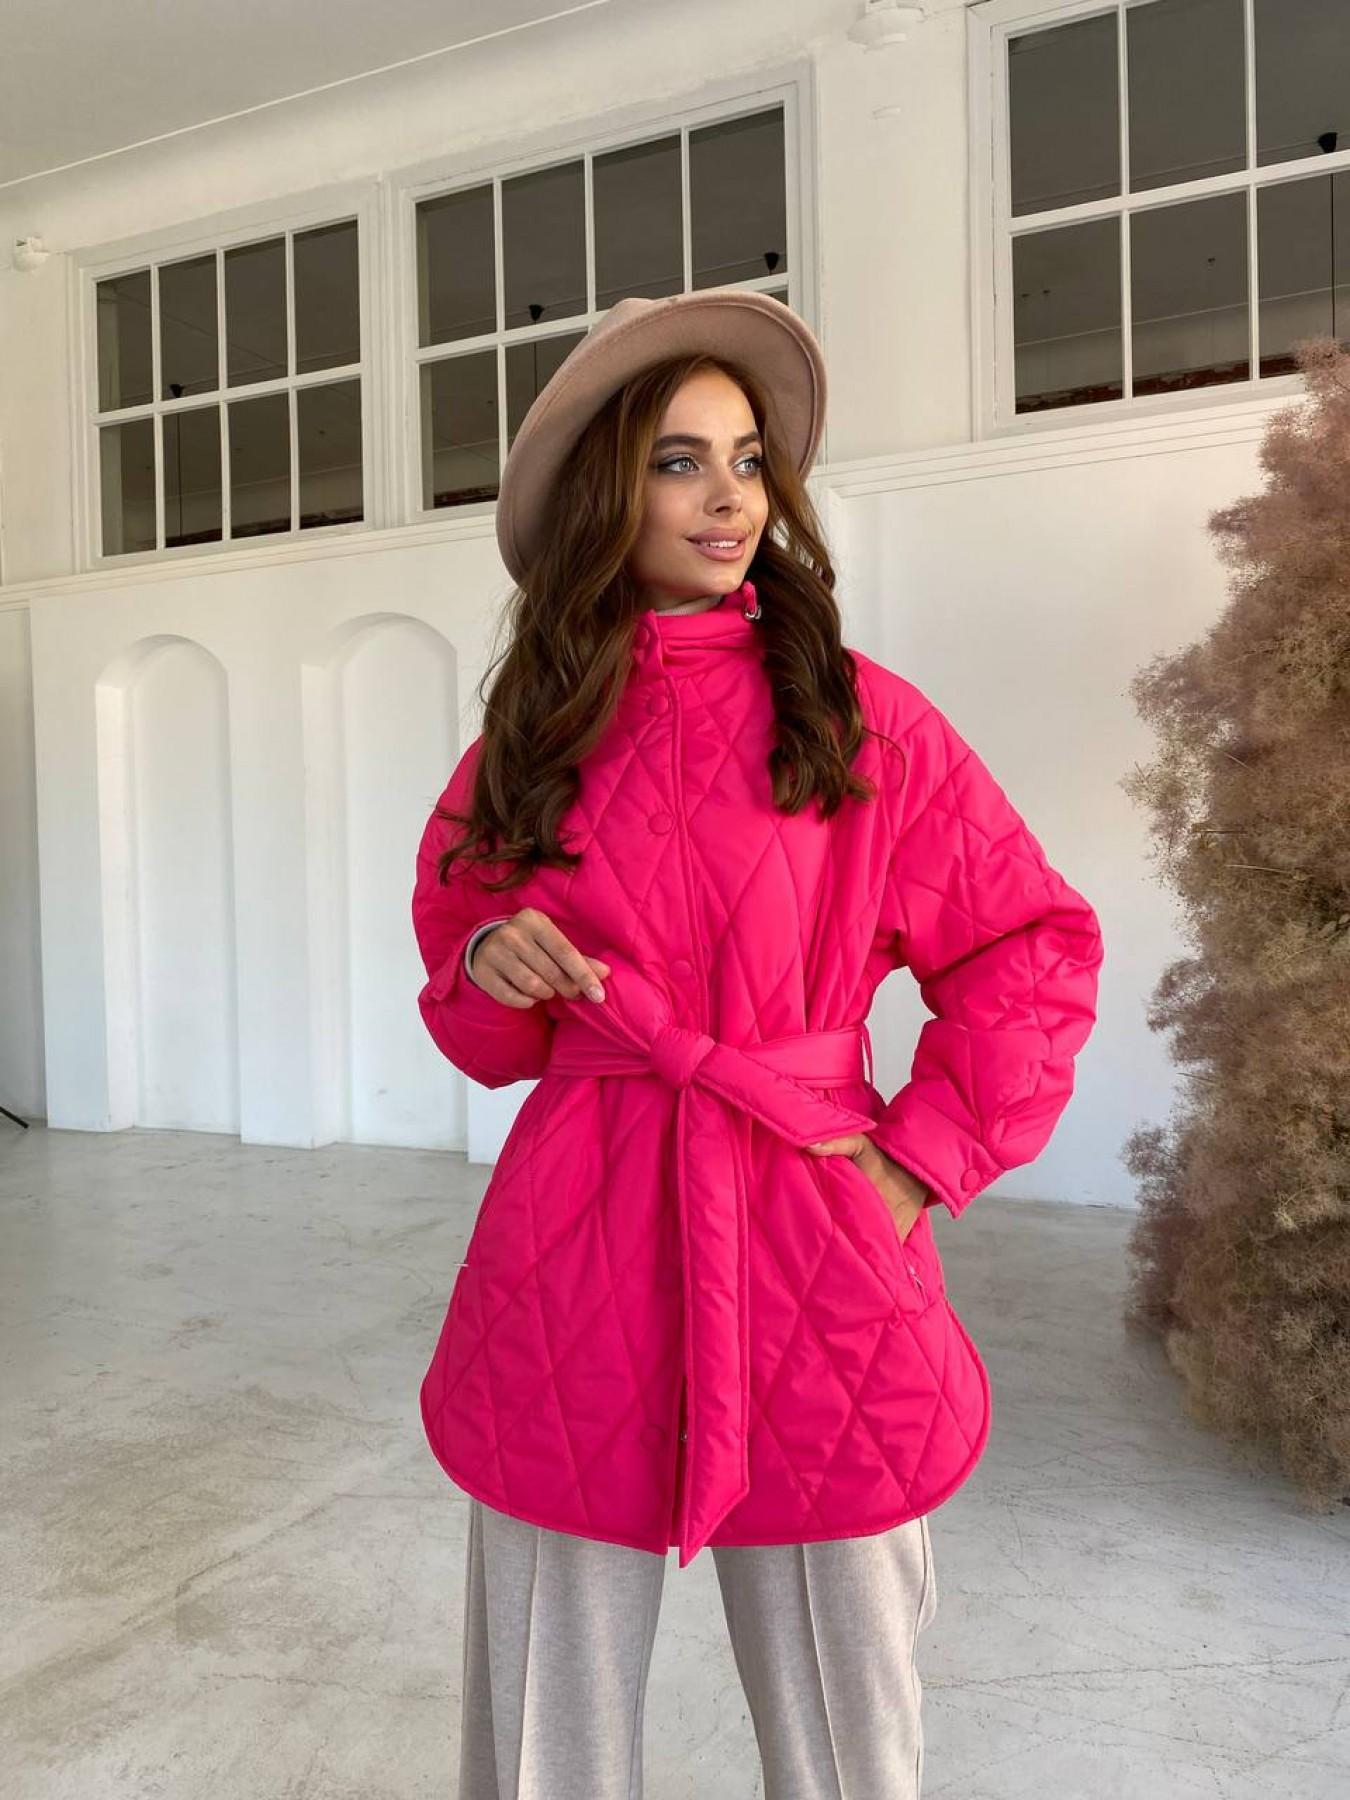 Пазл стеганая куртка из плащевки 11764 АРТ. 48504 Цвет: Малина - фото 5, интернет магазин tm-modus.ru